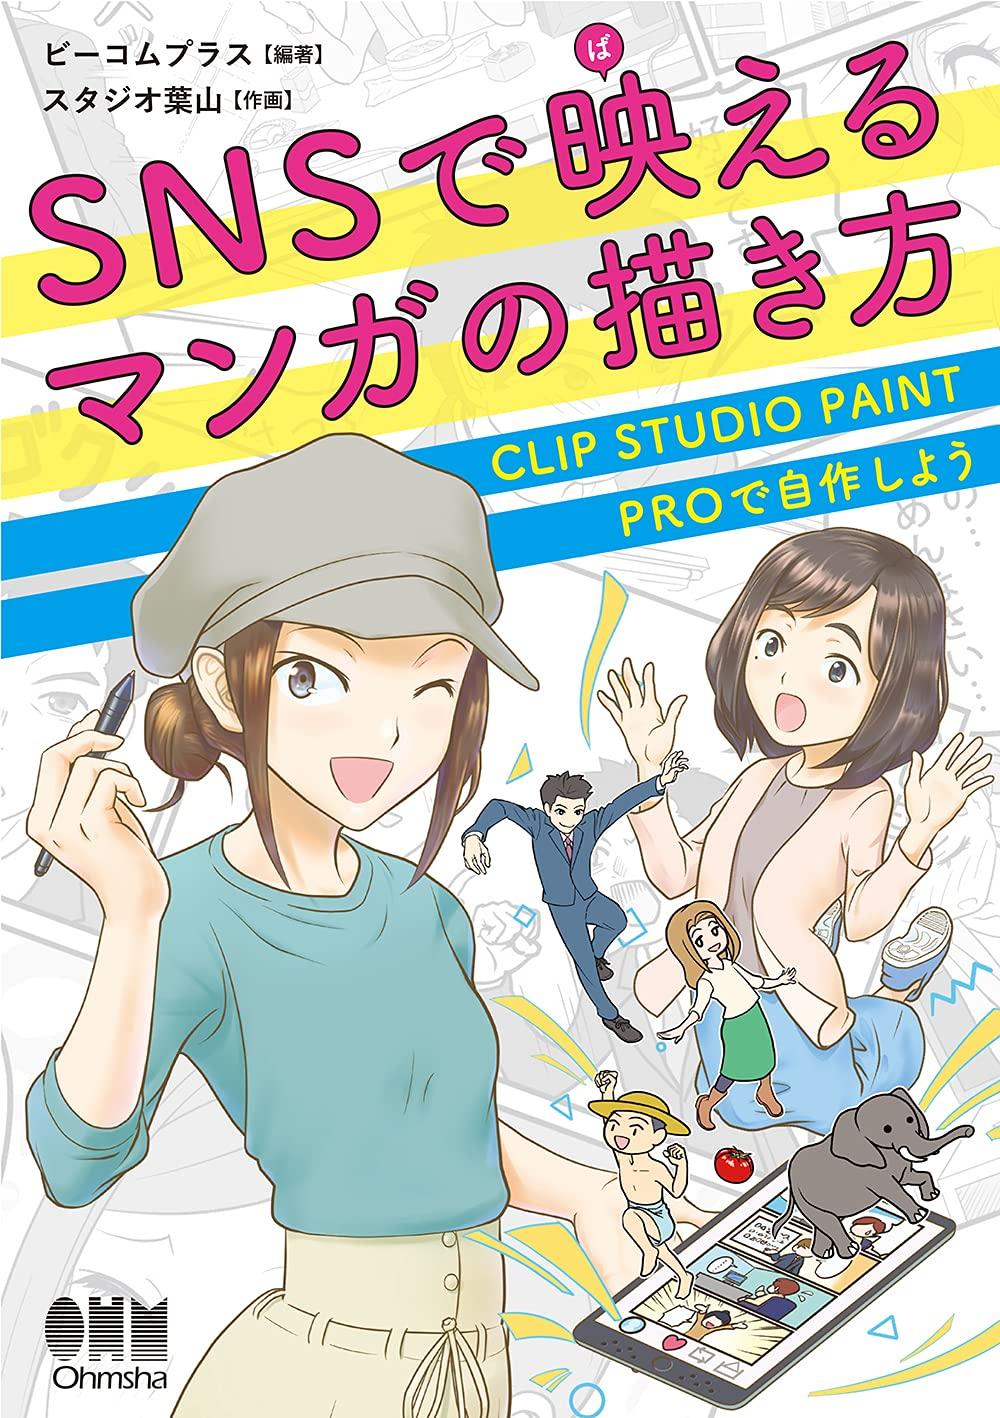 SNSで映えるマンガの描き方: CLIP STUDIO PAINT PROで自作しよう